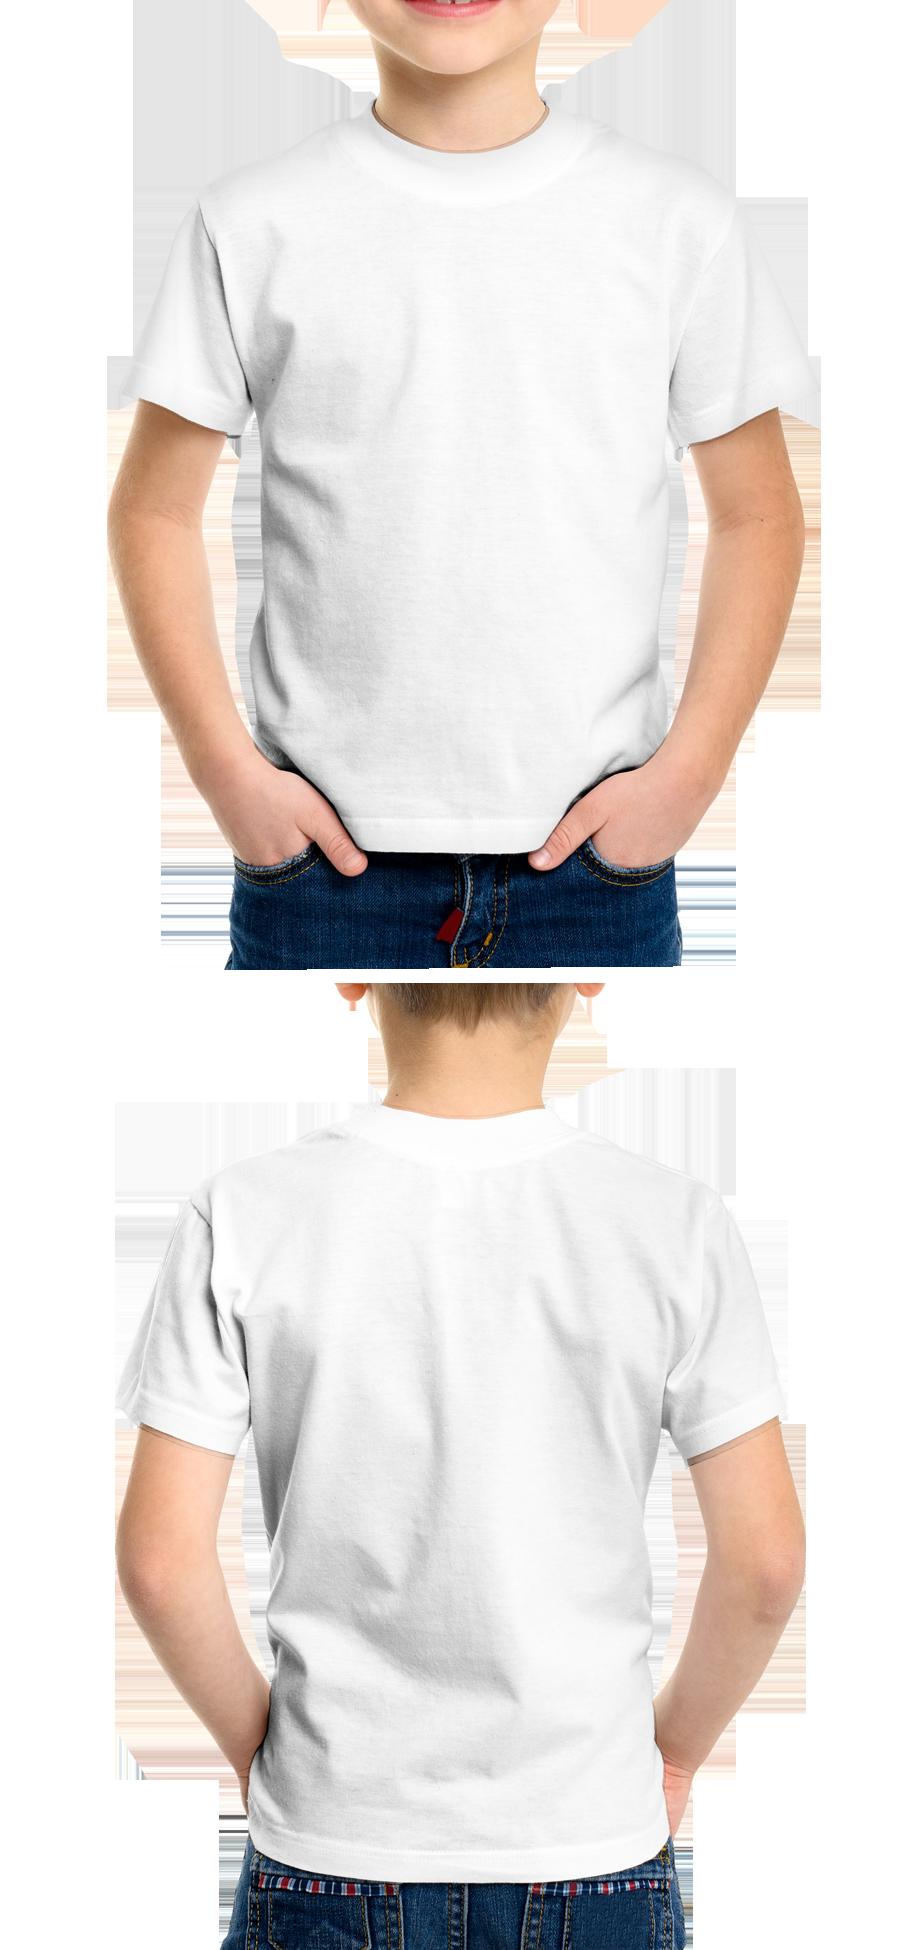 Regula celor sapte tricouri